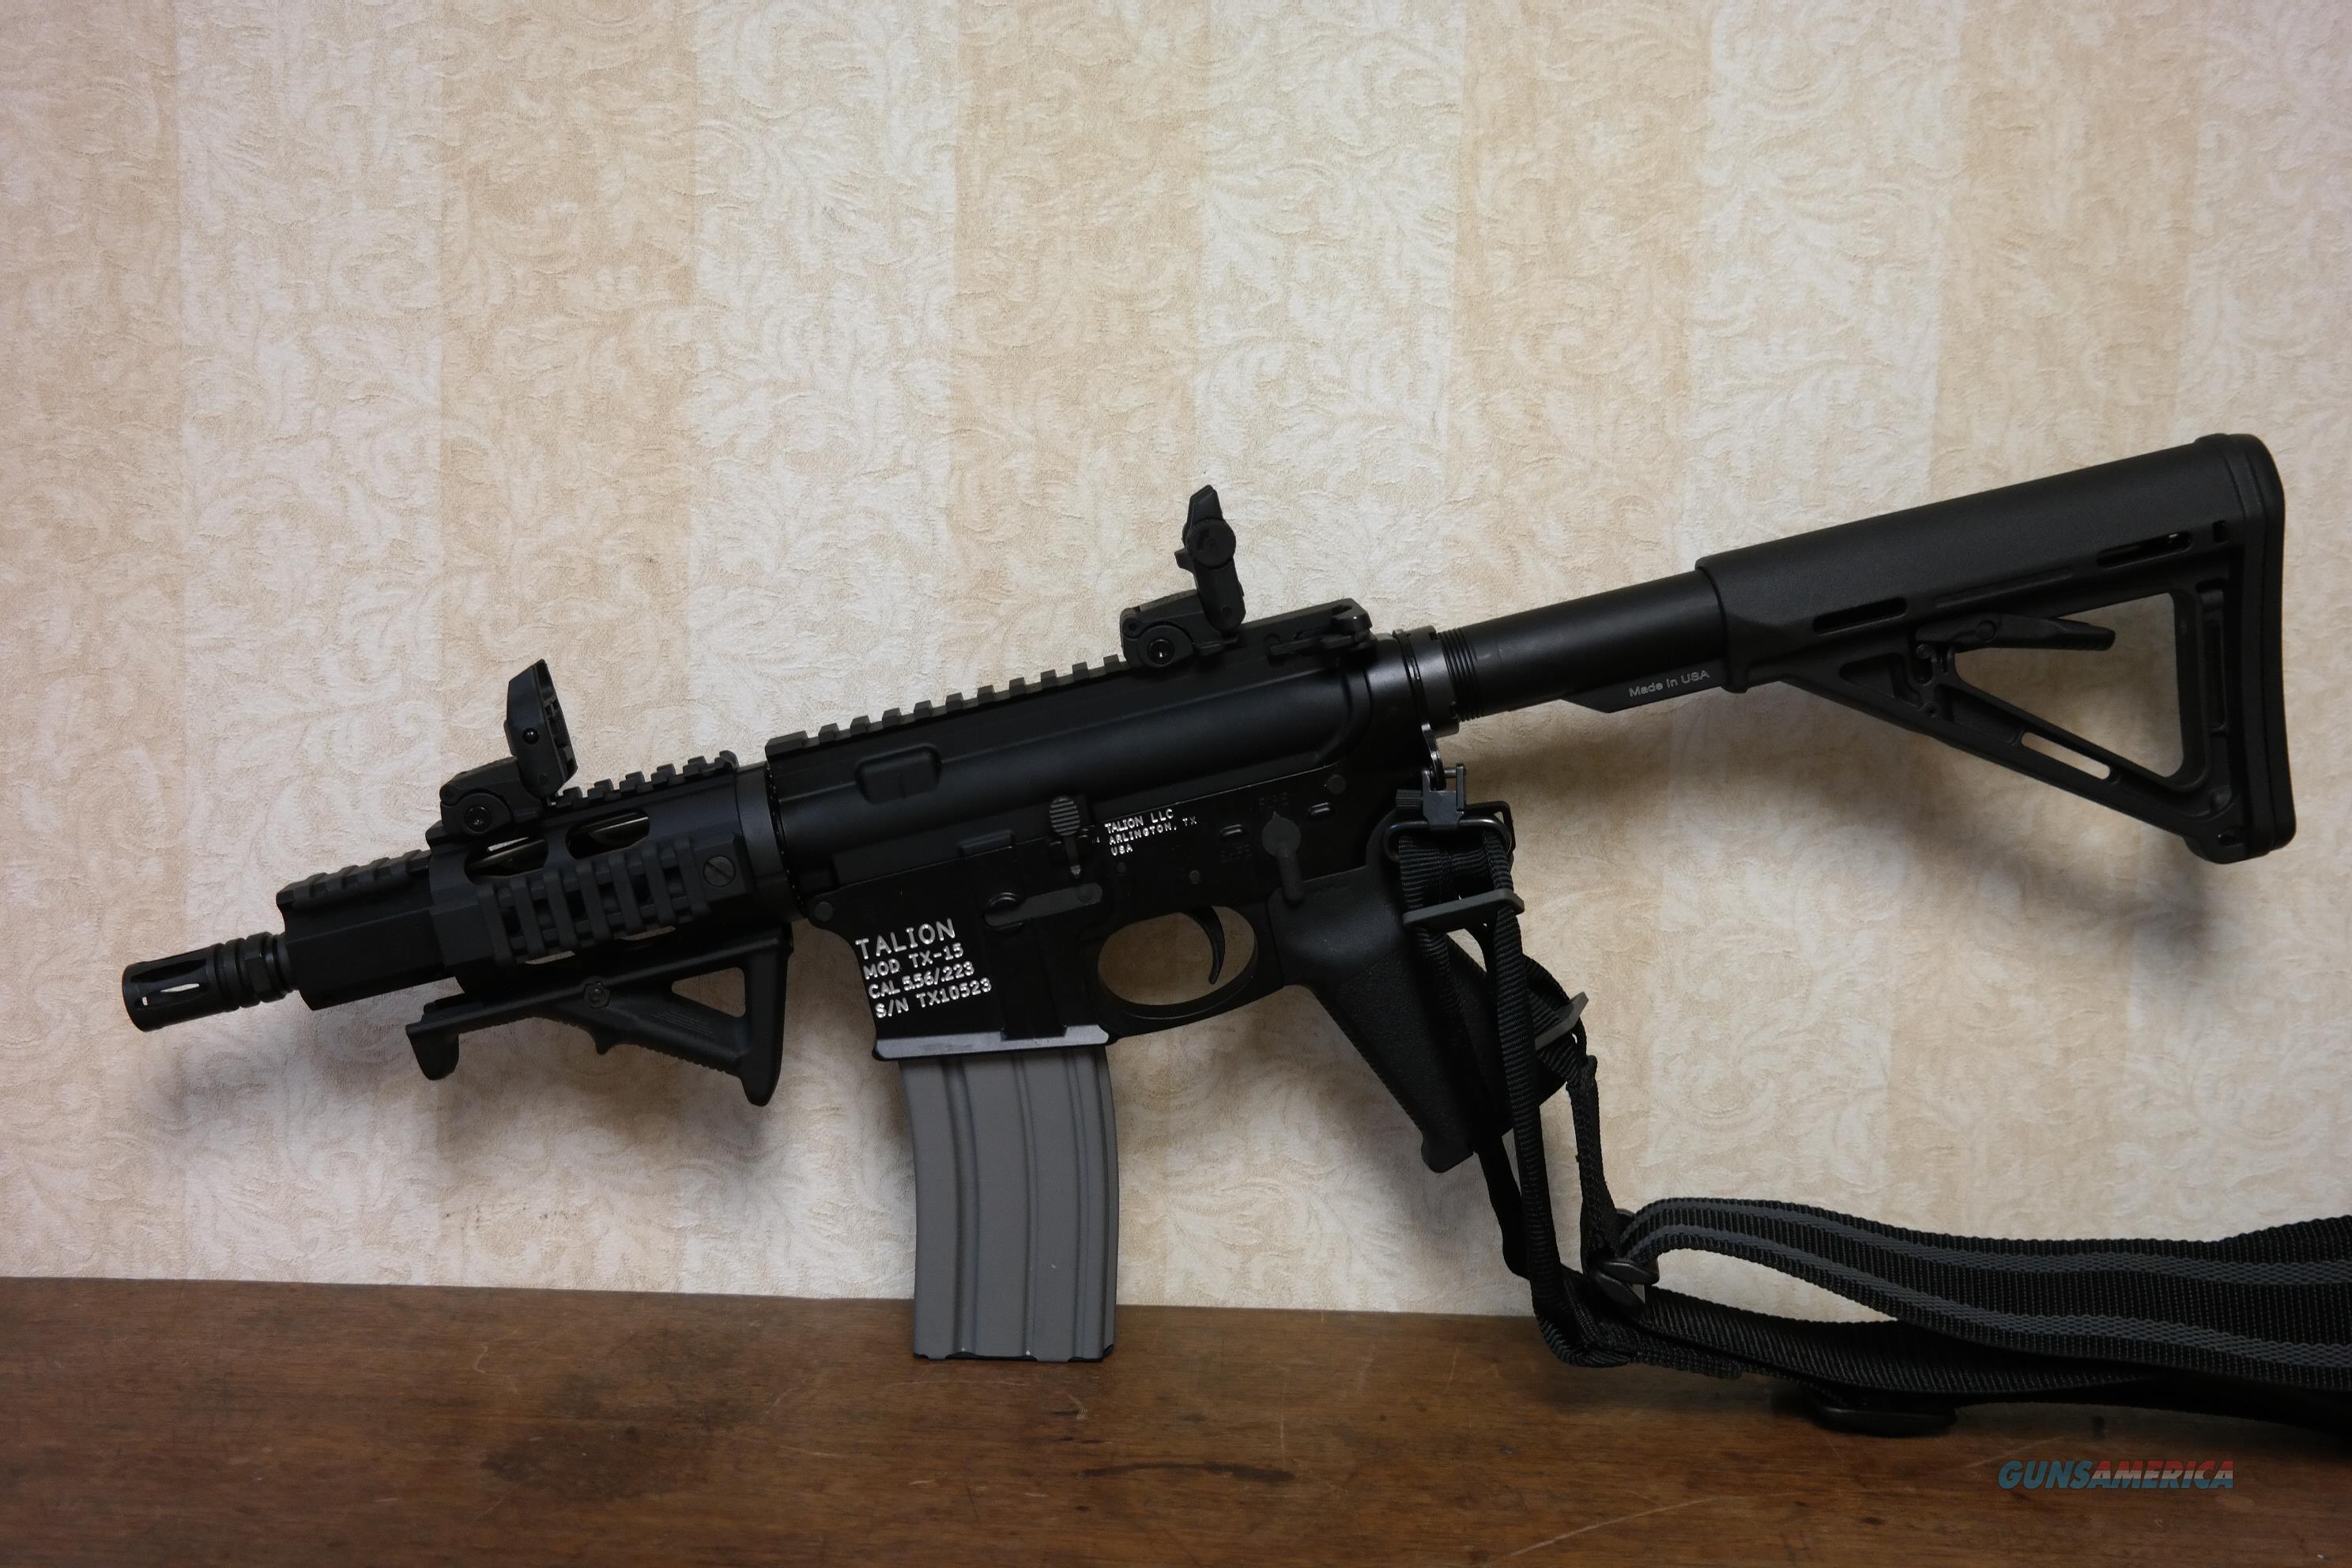 Talion TX15 SBR Class III  Guns > Rifles > Class 3 Rifles > Class 3 Any Other Weapon